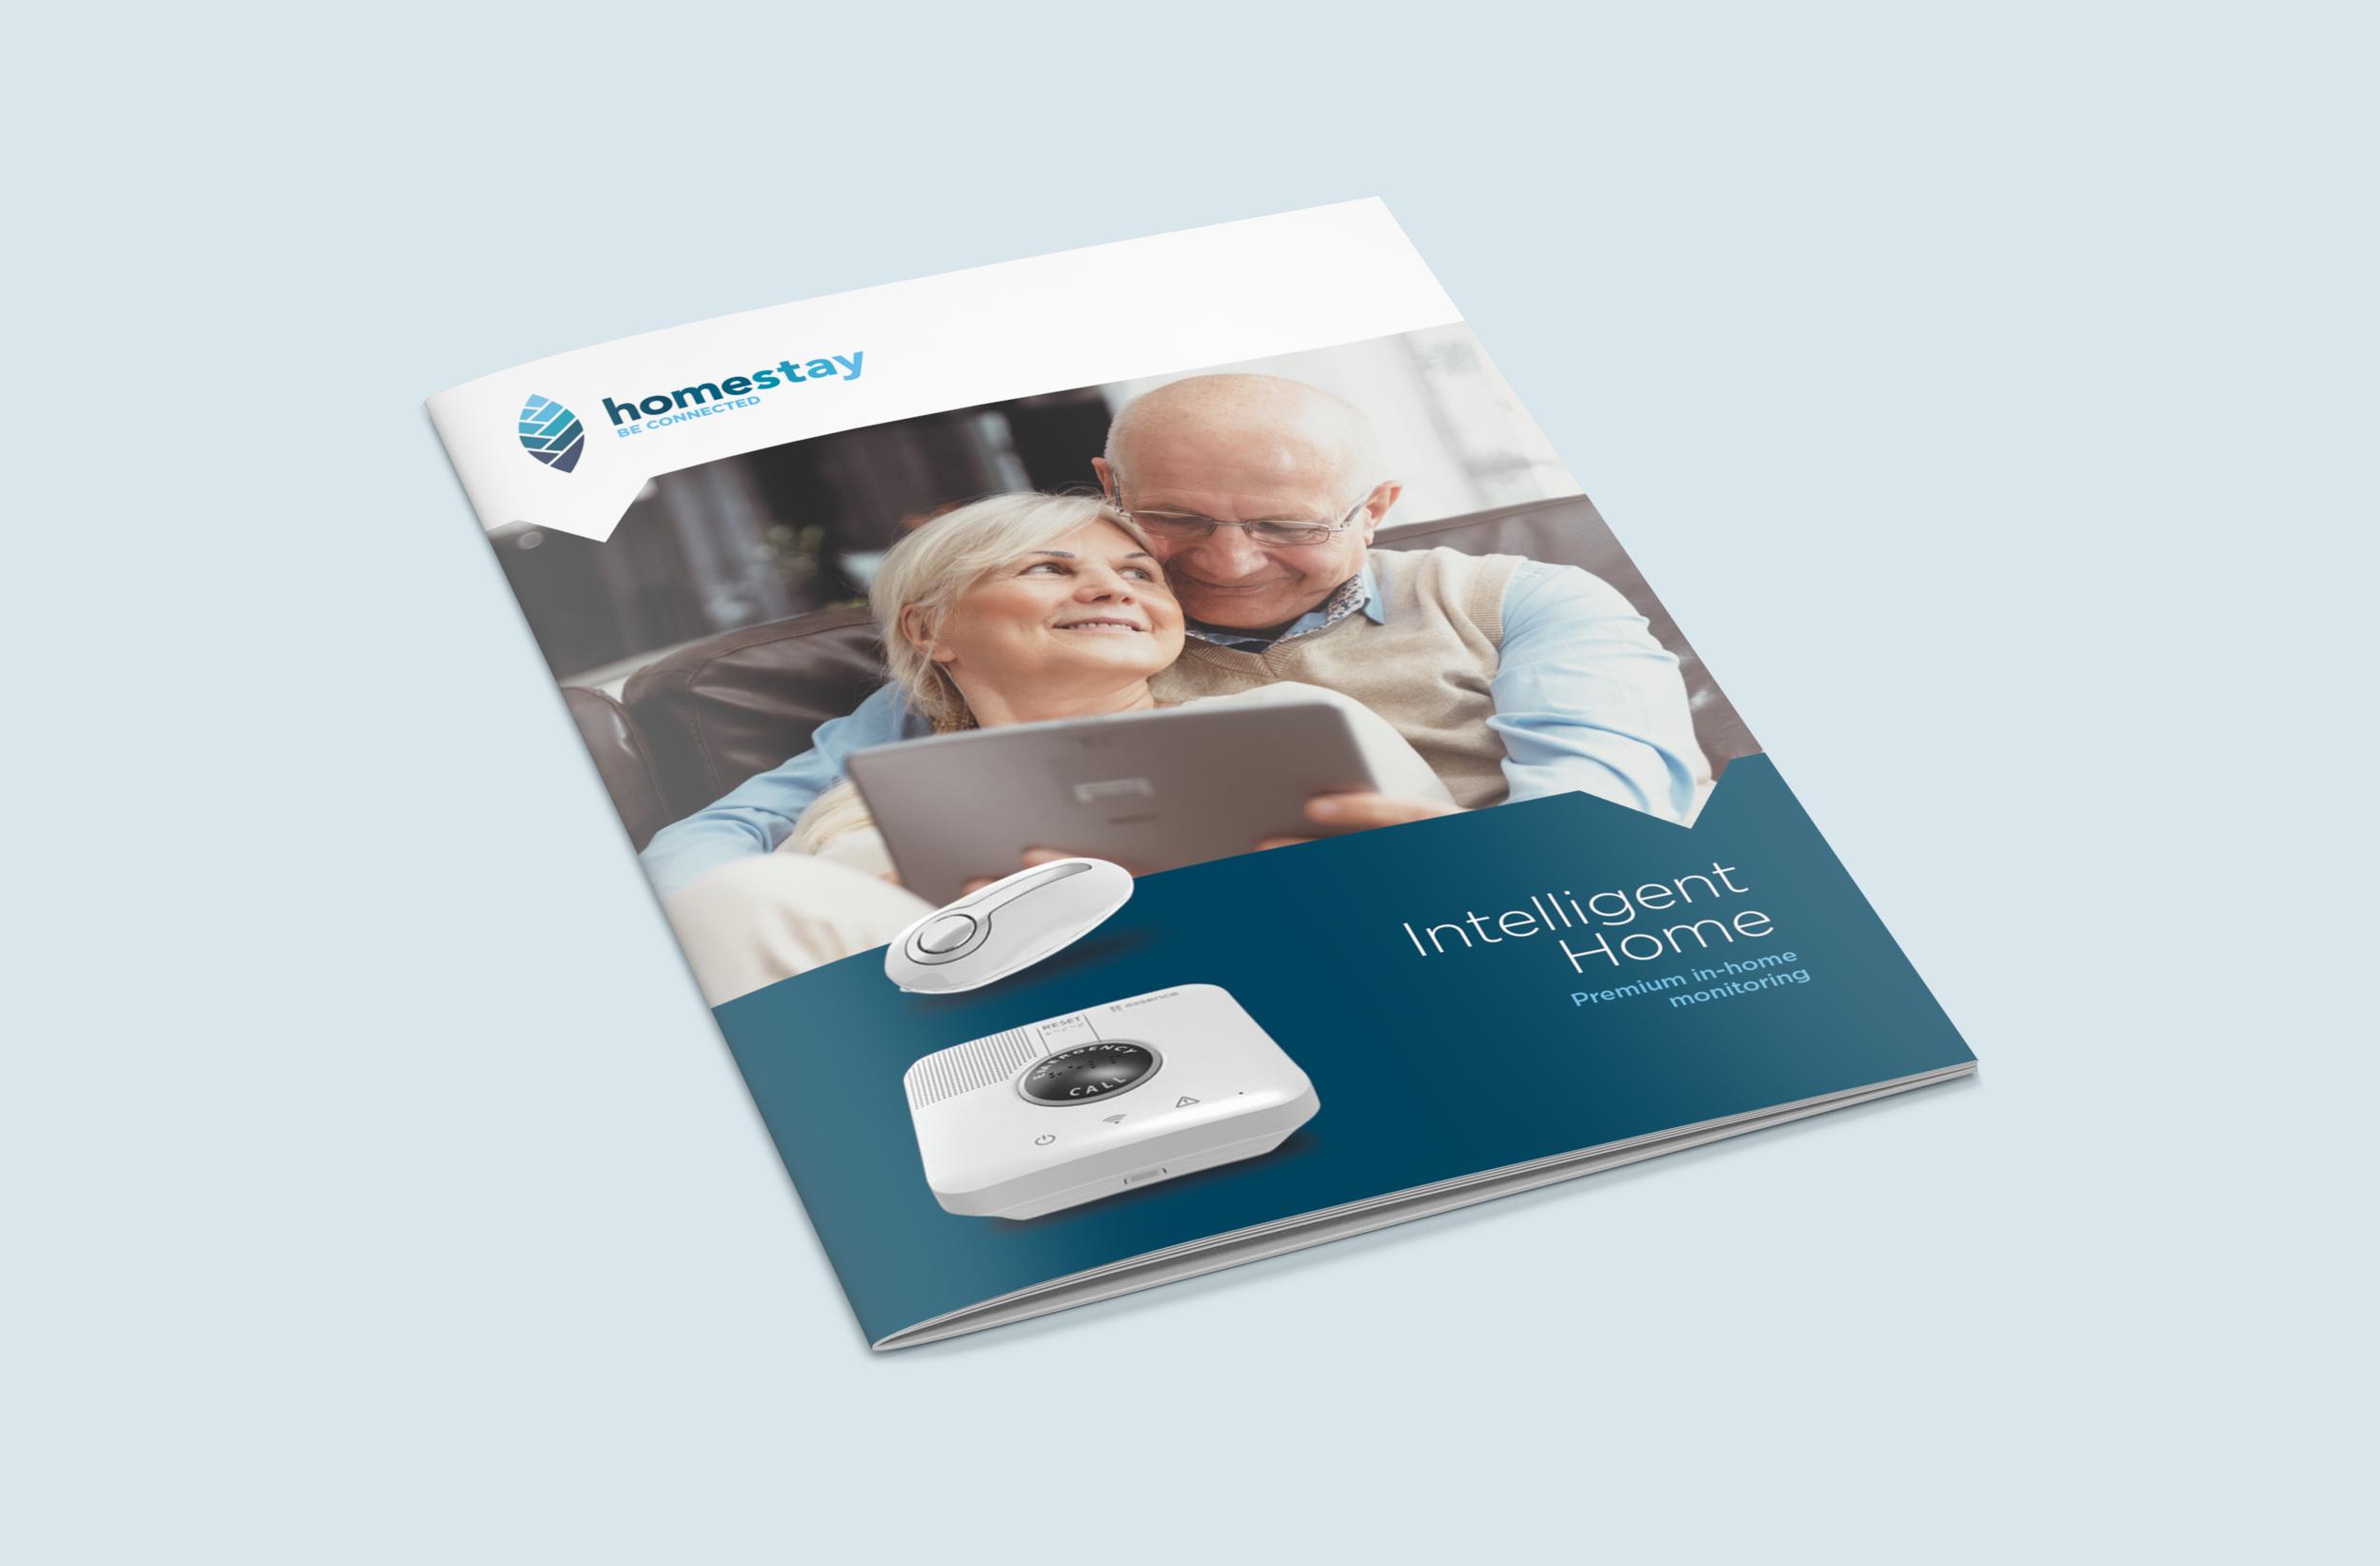 homestay-brochure.png